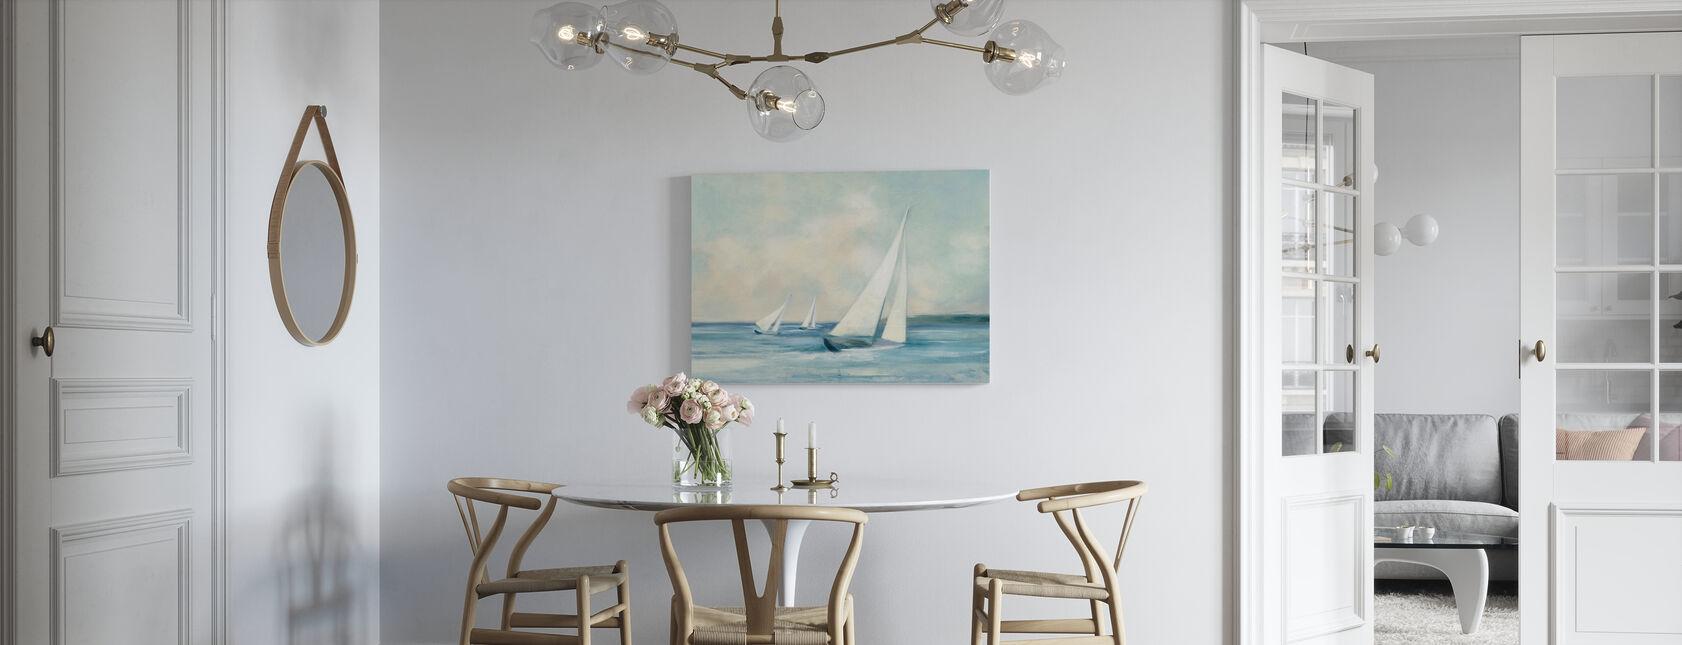 Segelboote bei Sunrise - Leinwandbild - Küchen